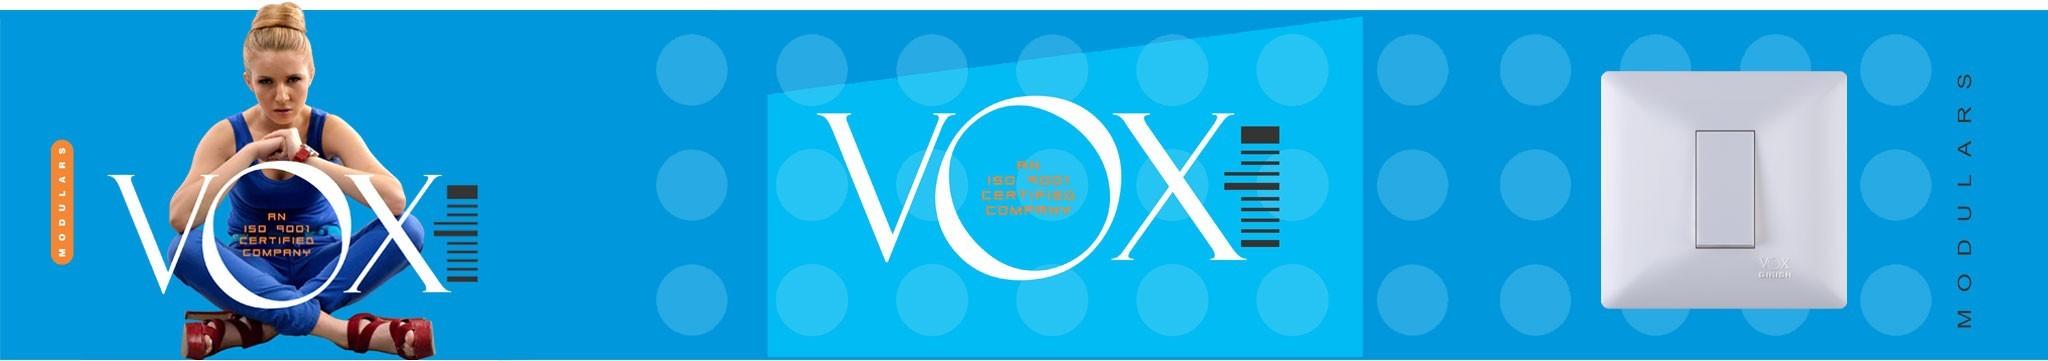 Vox-Plates